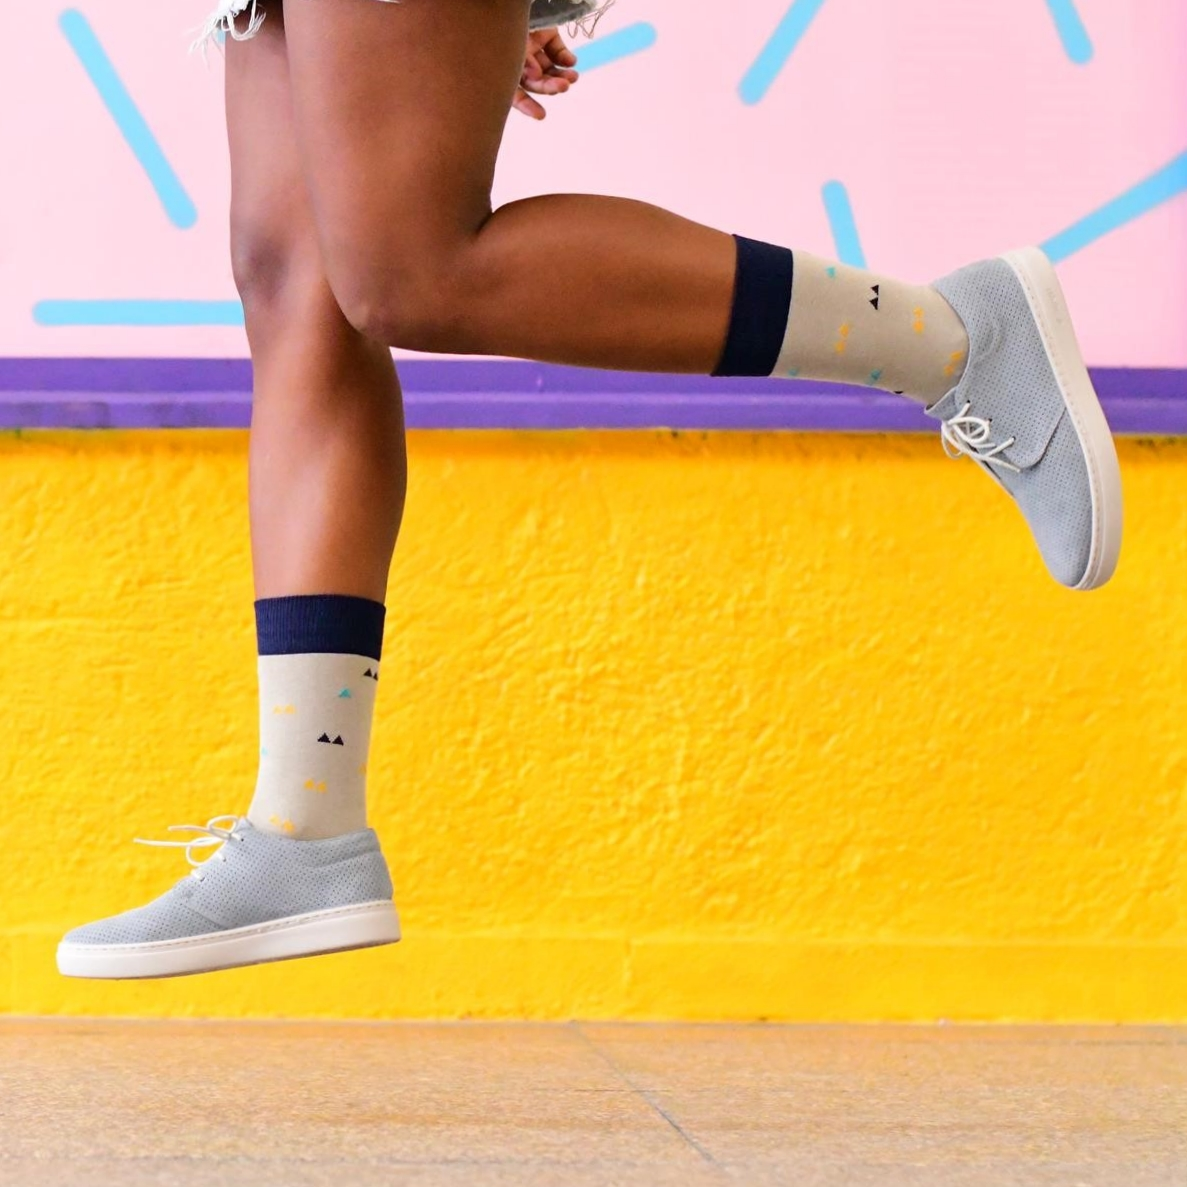 AmorSocks-calcetines-socks-colaboracion-barqet-triangulos-paradigma-topo-verde-azul-amarillo-series-limitadas